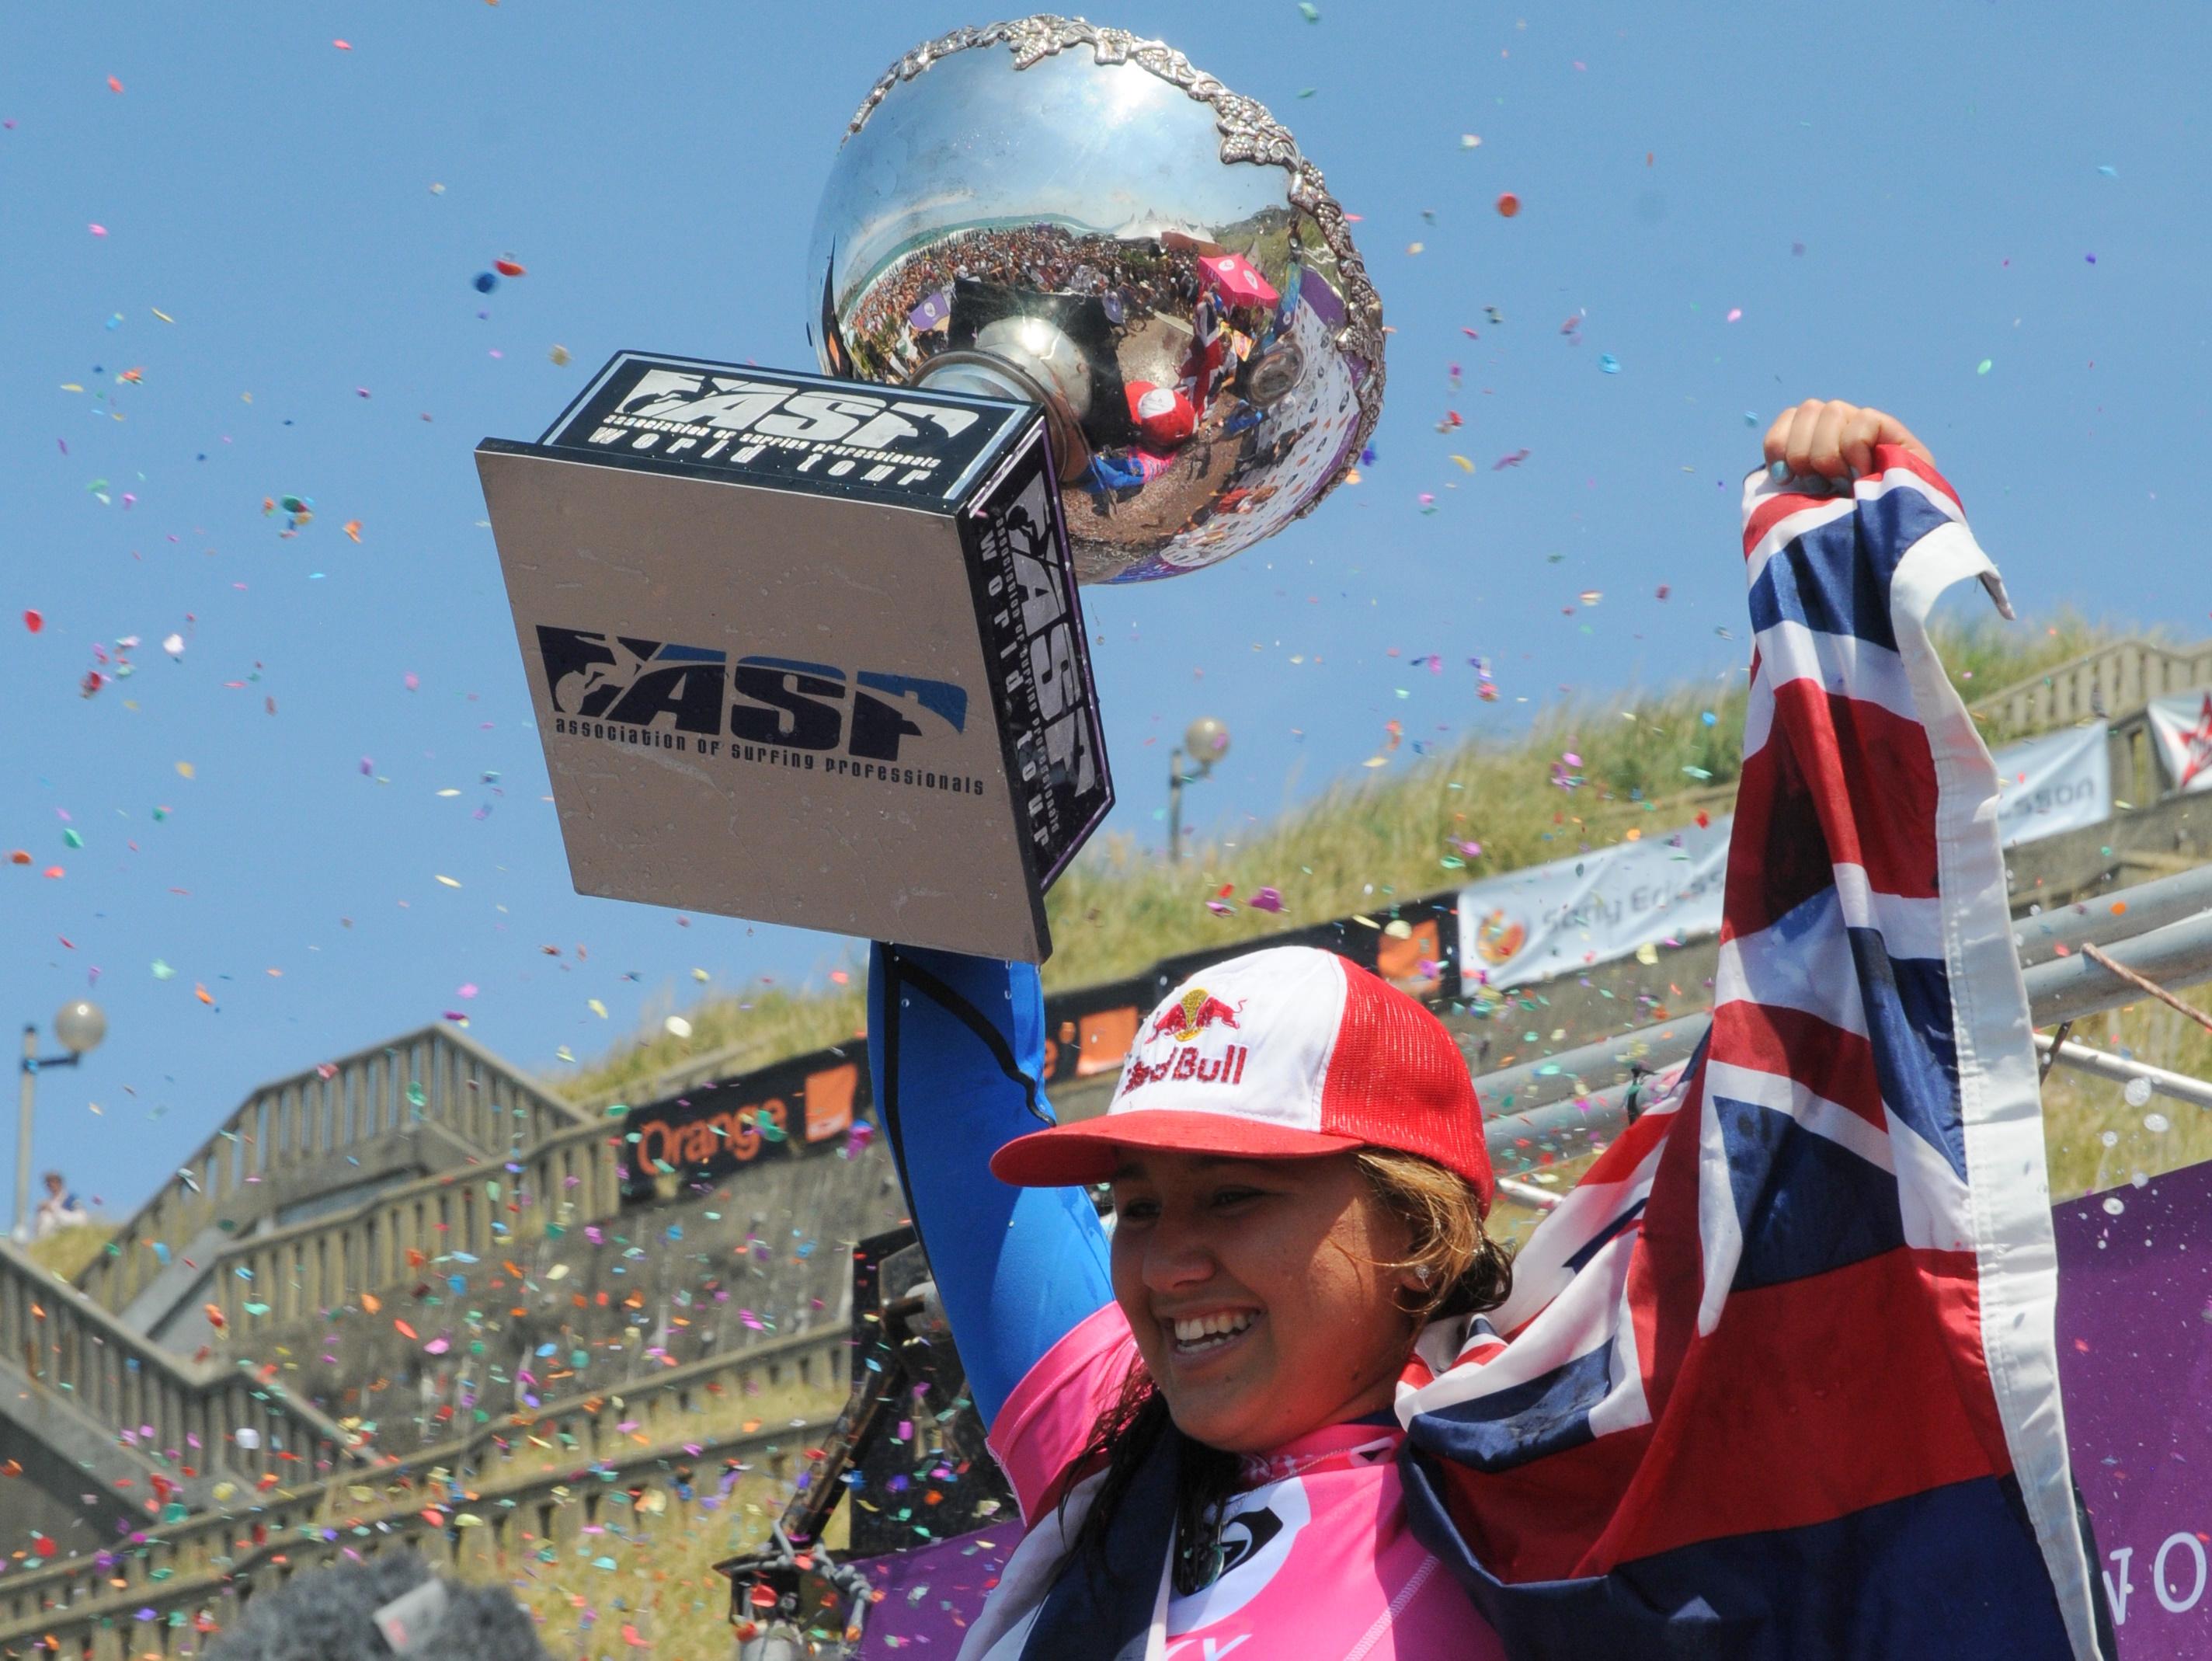 Carissa World Champion